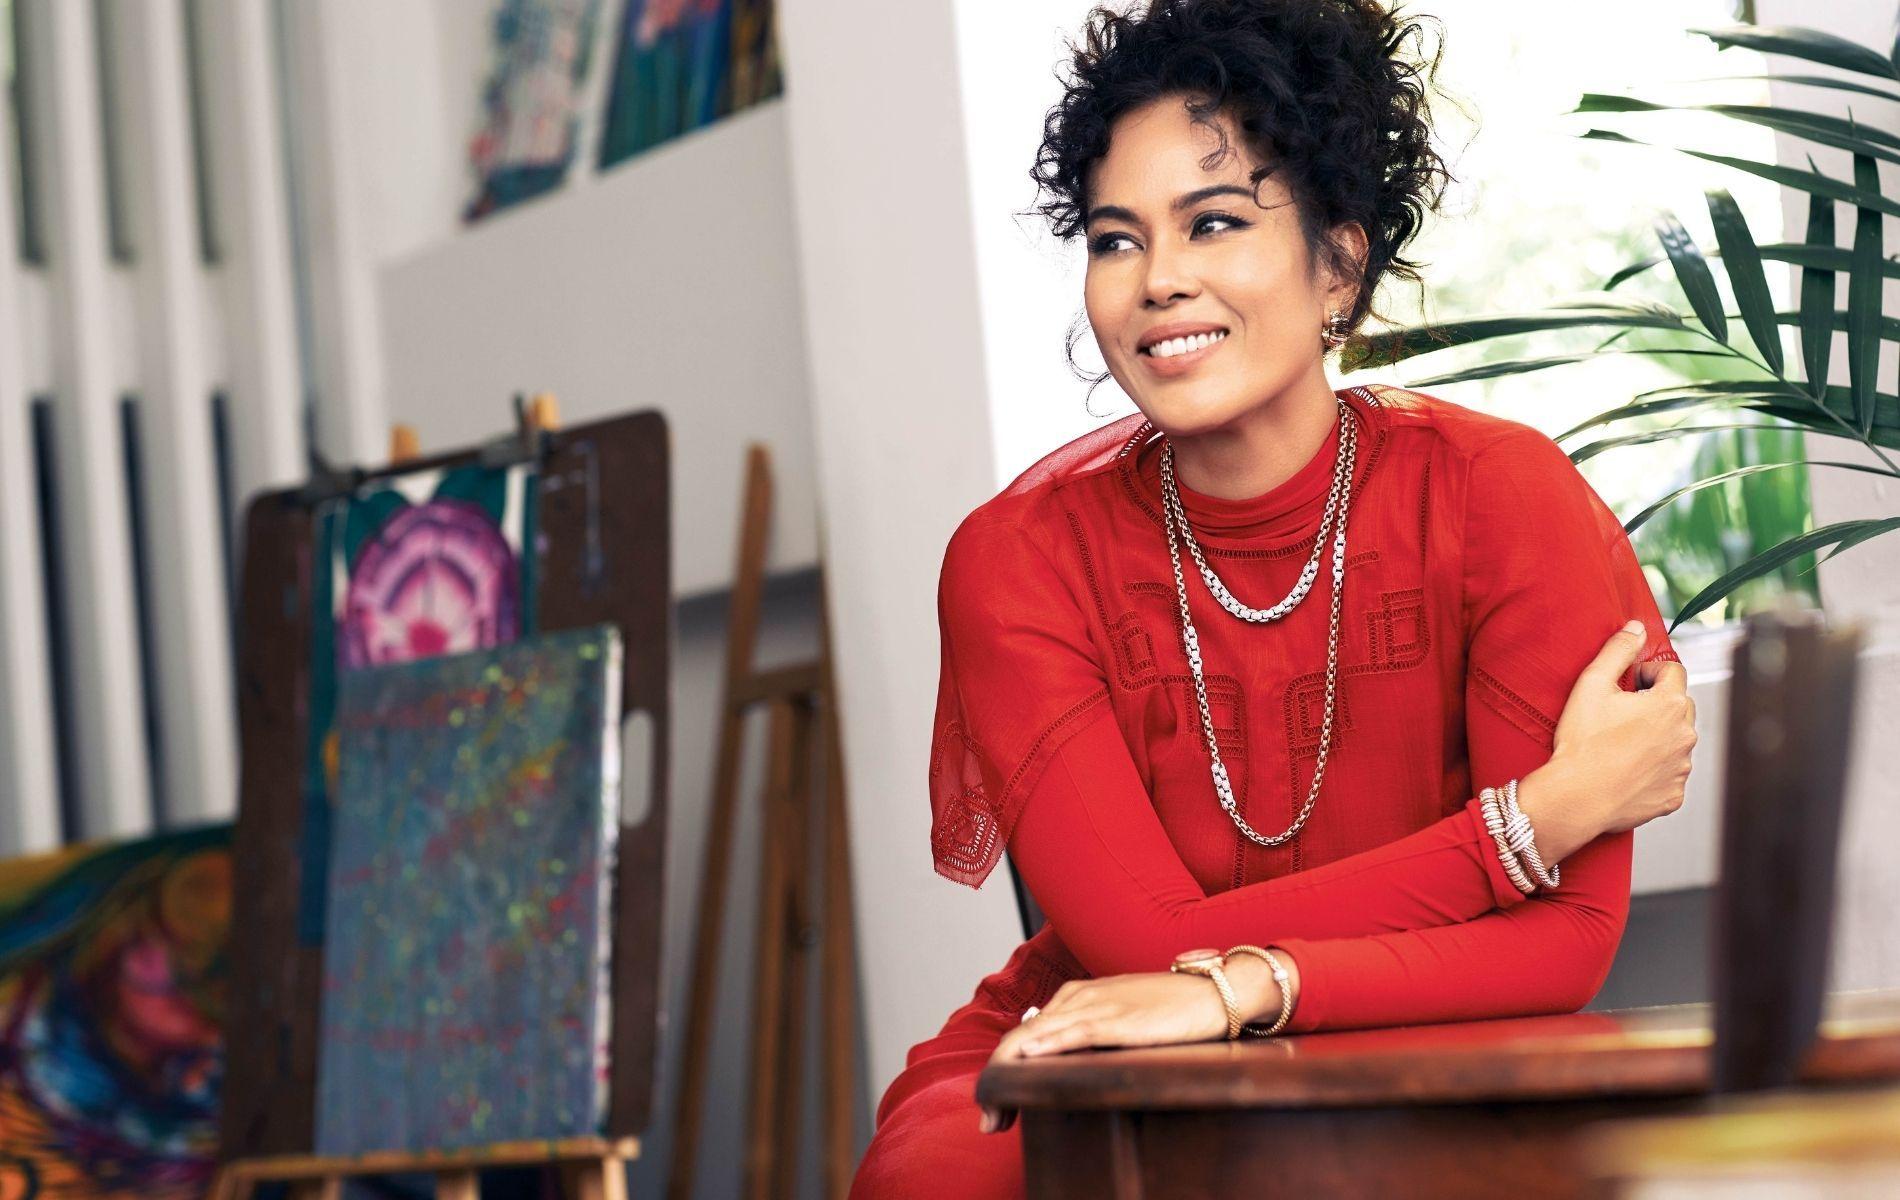 Cover Story: Inside The Fascinating World Of Nini Marini, Artist And Creative Entrepreneur